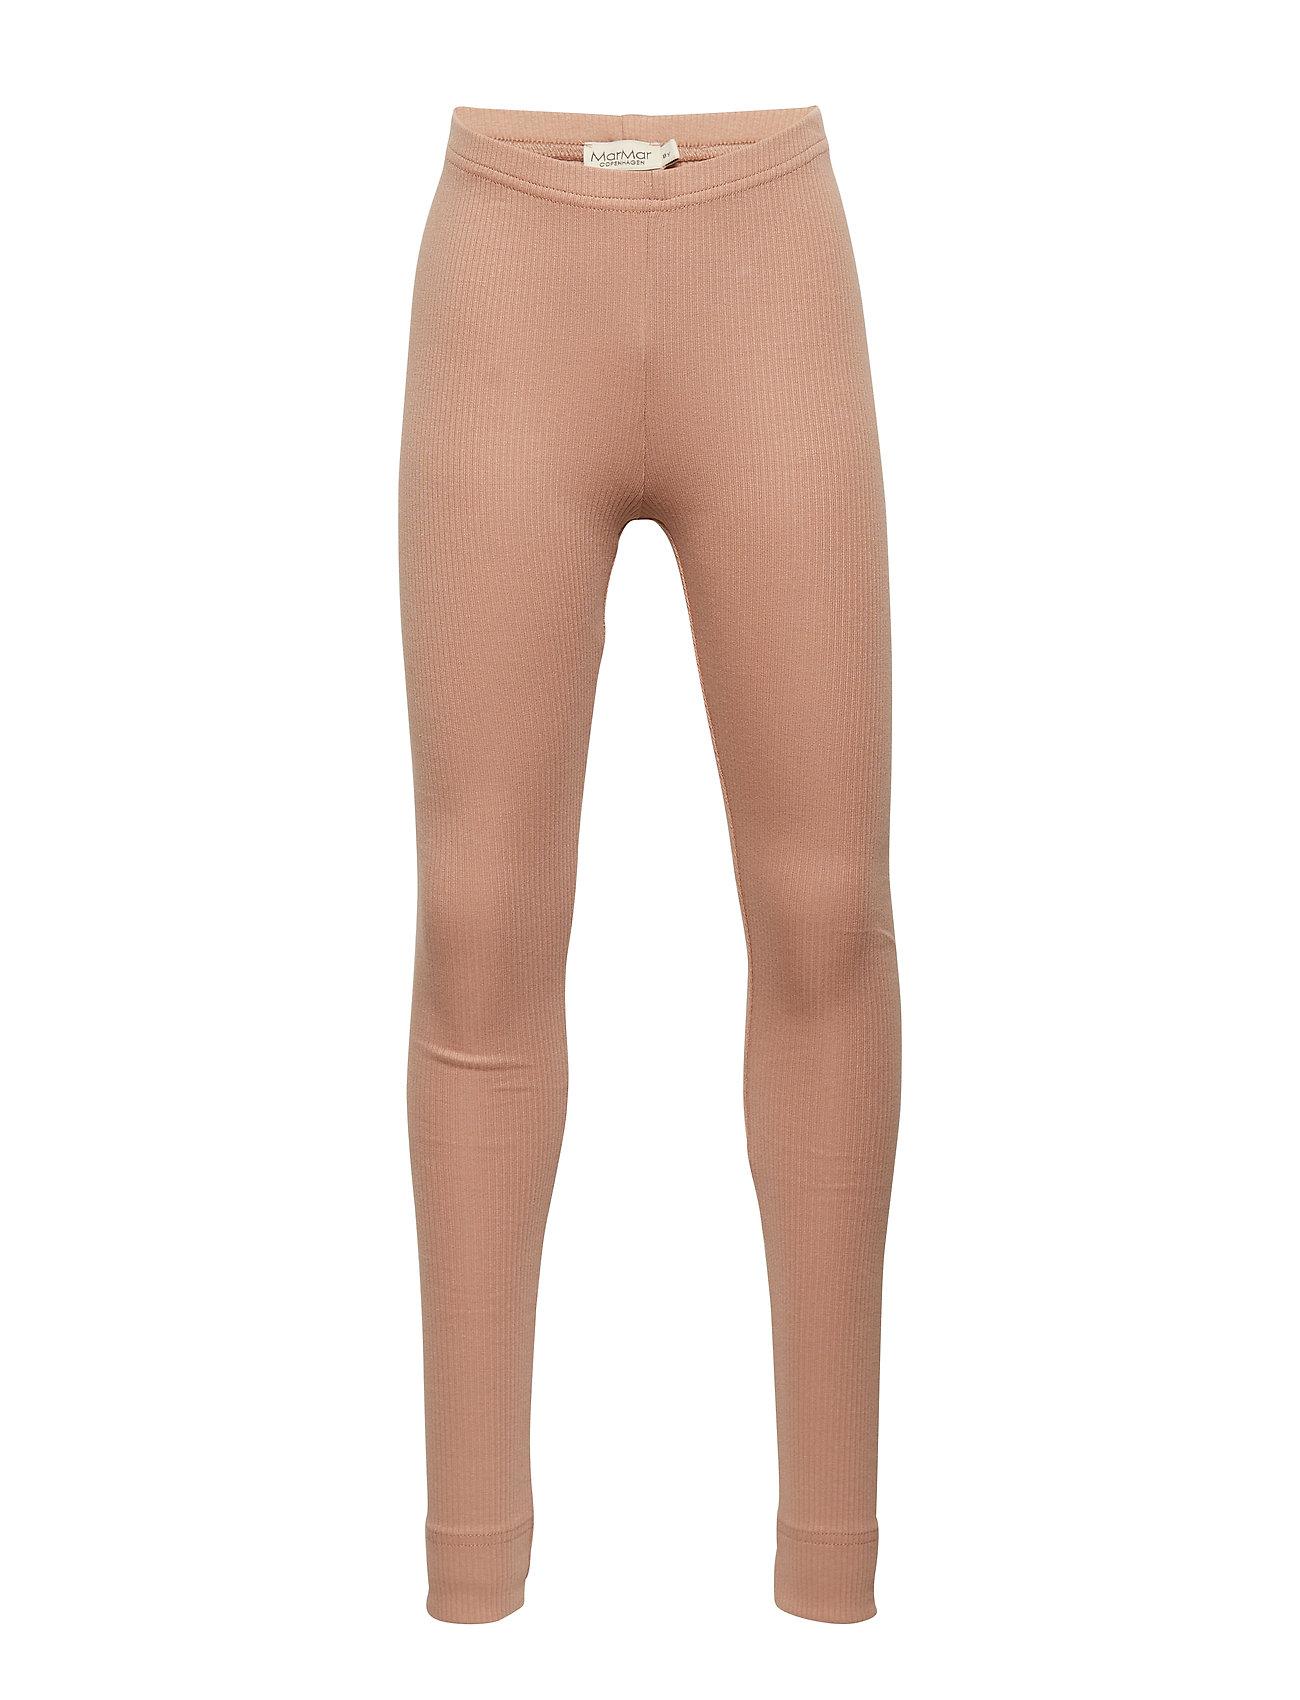 MarMar Cph Leg - ROSE BROWN